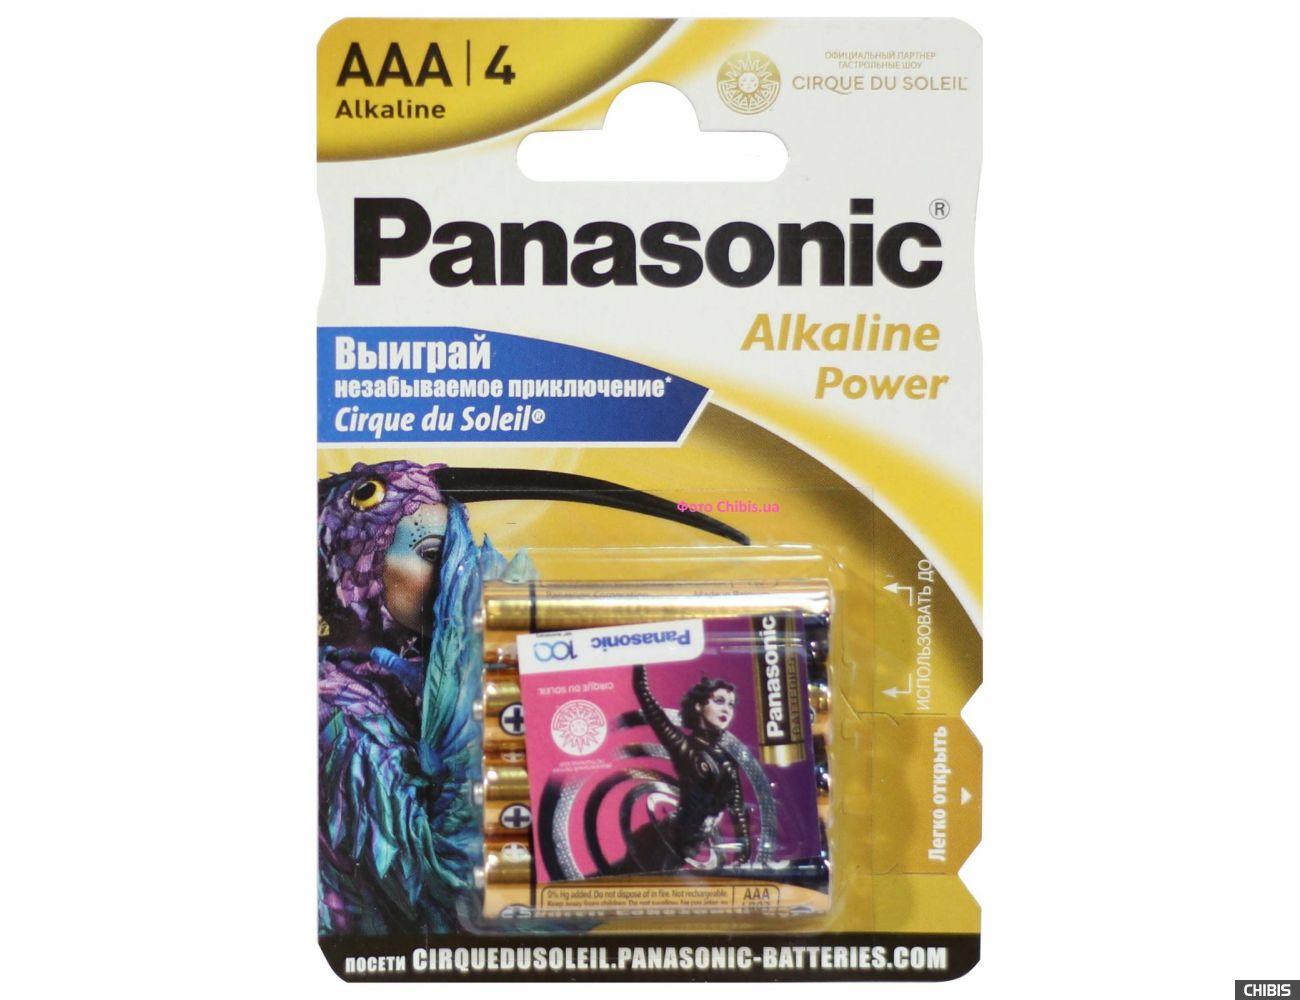 Батарейка ААА Panasonic Alkaline Power LR03 1.5V Cirque du Soleil блистер 4/4 шт.